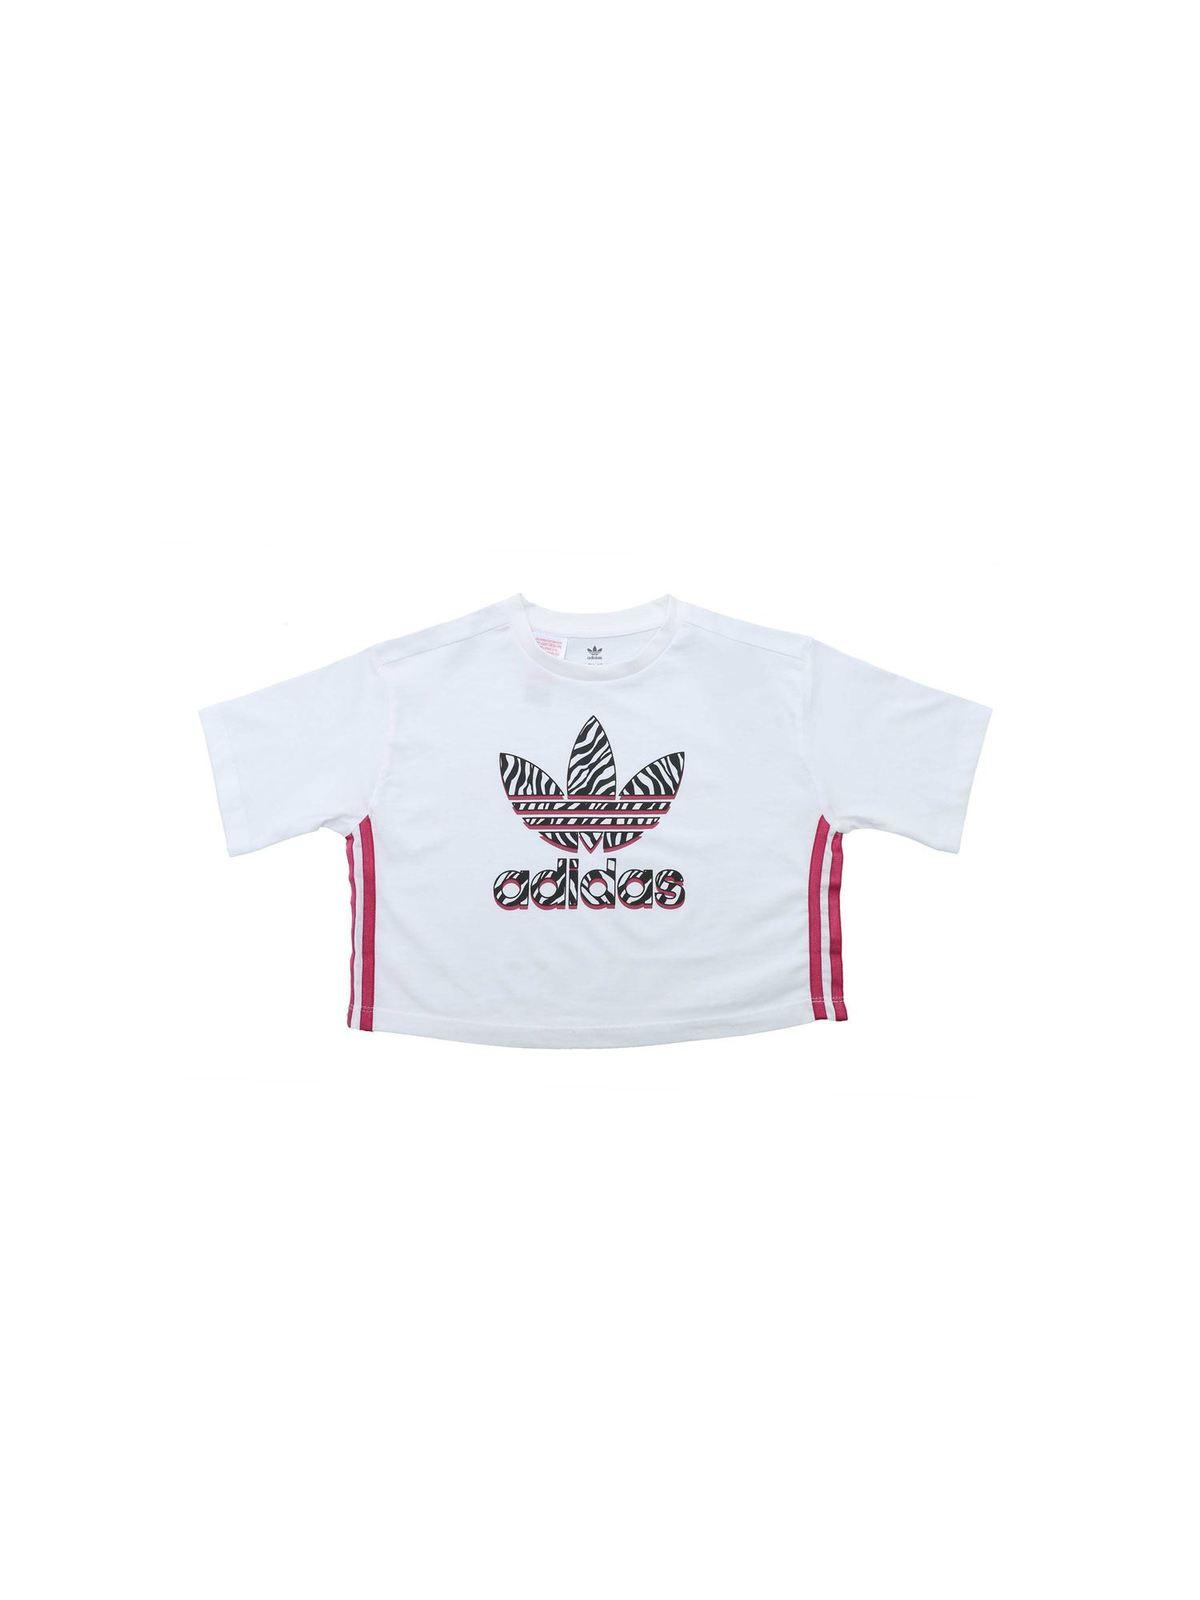 Adidas Originals Kids' Adidas Girls' Originals Zebra-infill Trefoil Cropped T-shirt In White